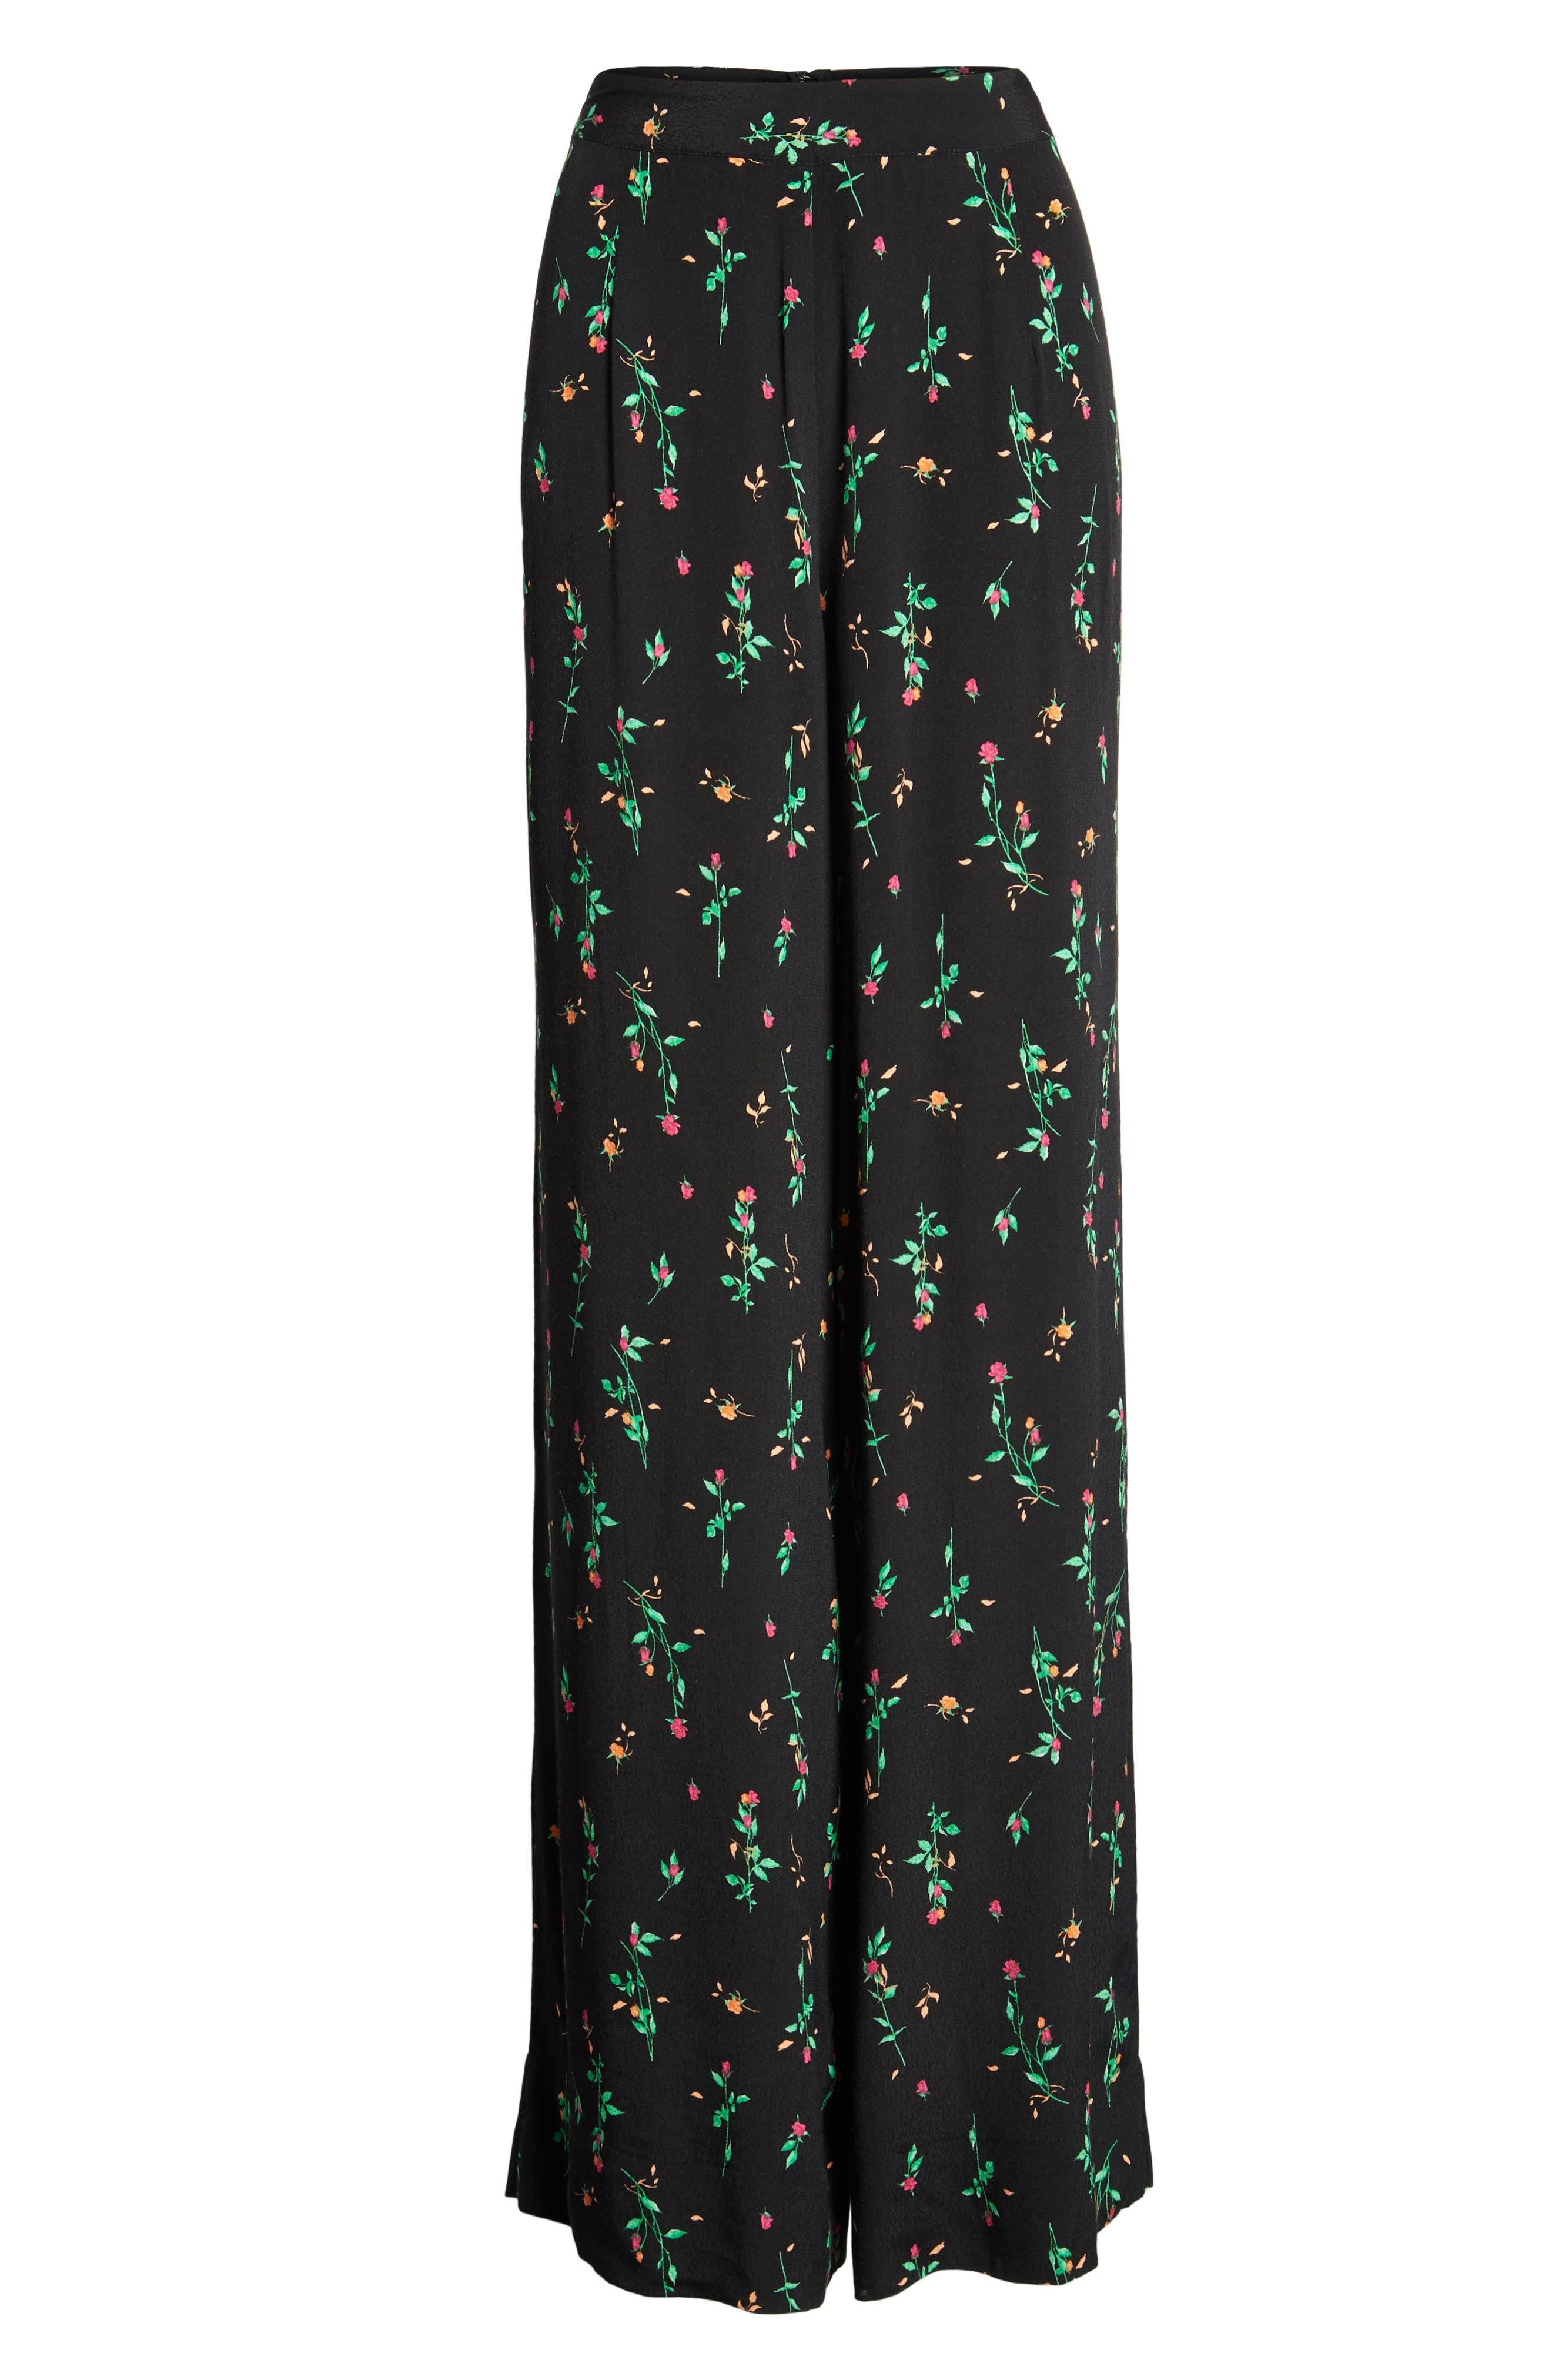 Carter High Waist Wide Leg Pants,                             Alternate thumbnail 7, color,                             Noir Rose Ditsy